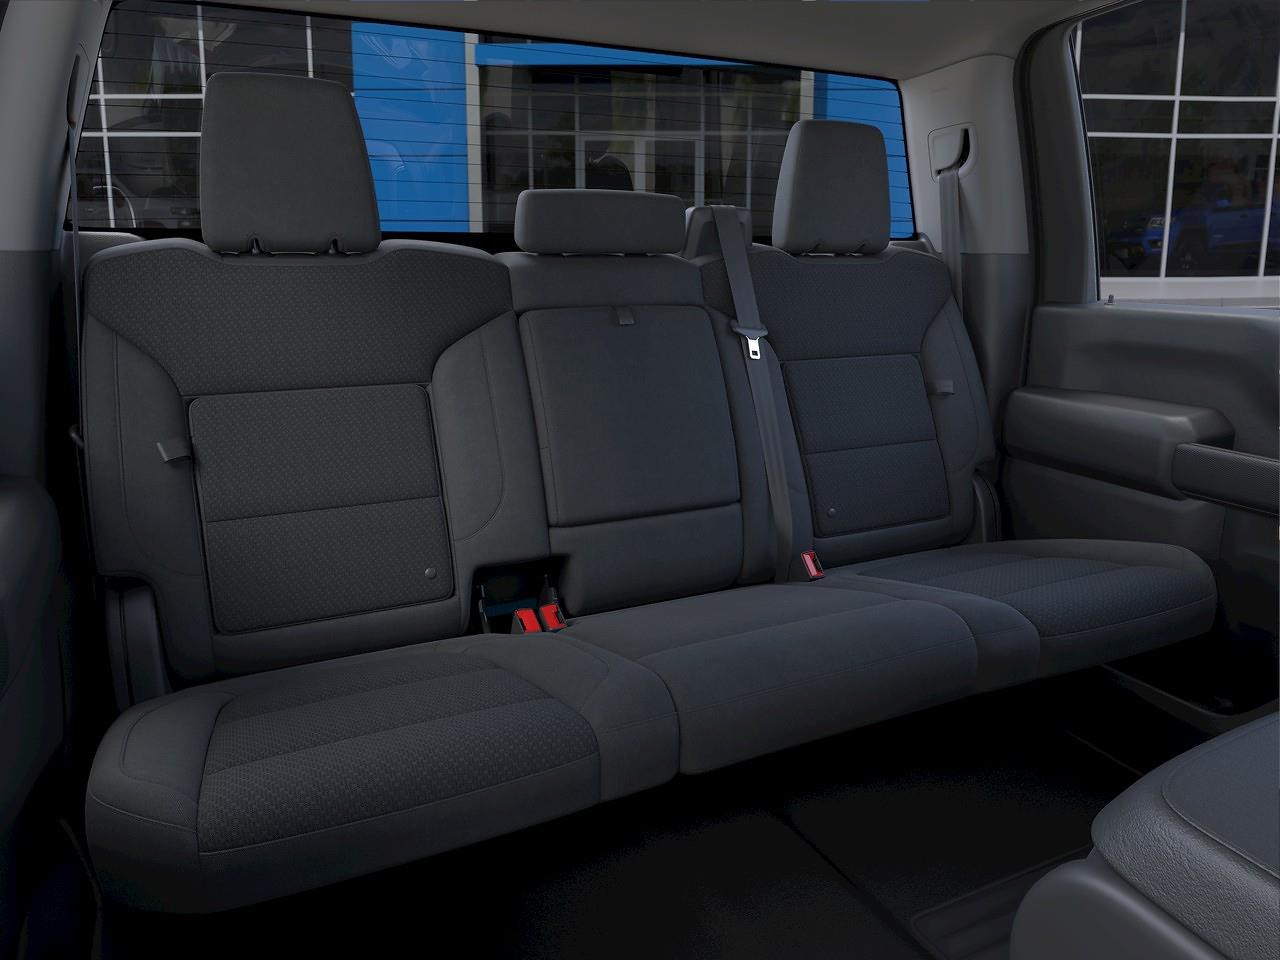 2021 Chevrolet Silverado 2500 Crew Cab 4x4, Pickup #Q210471 - photo 14